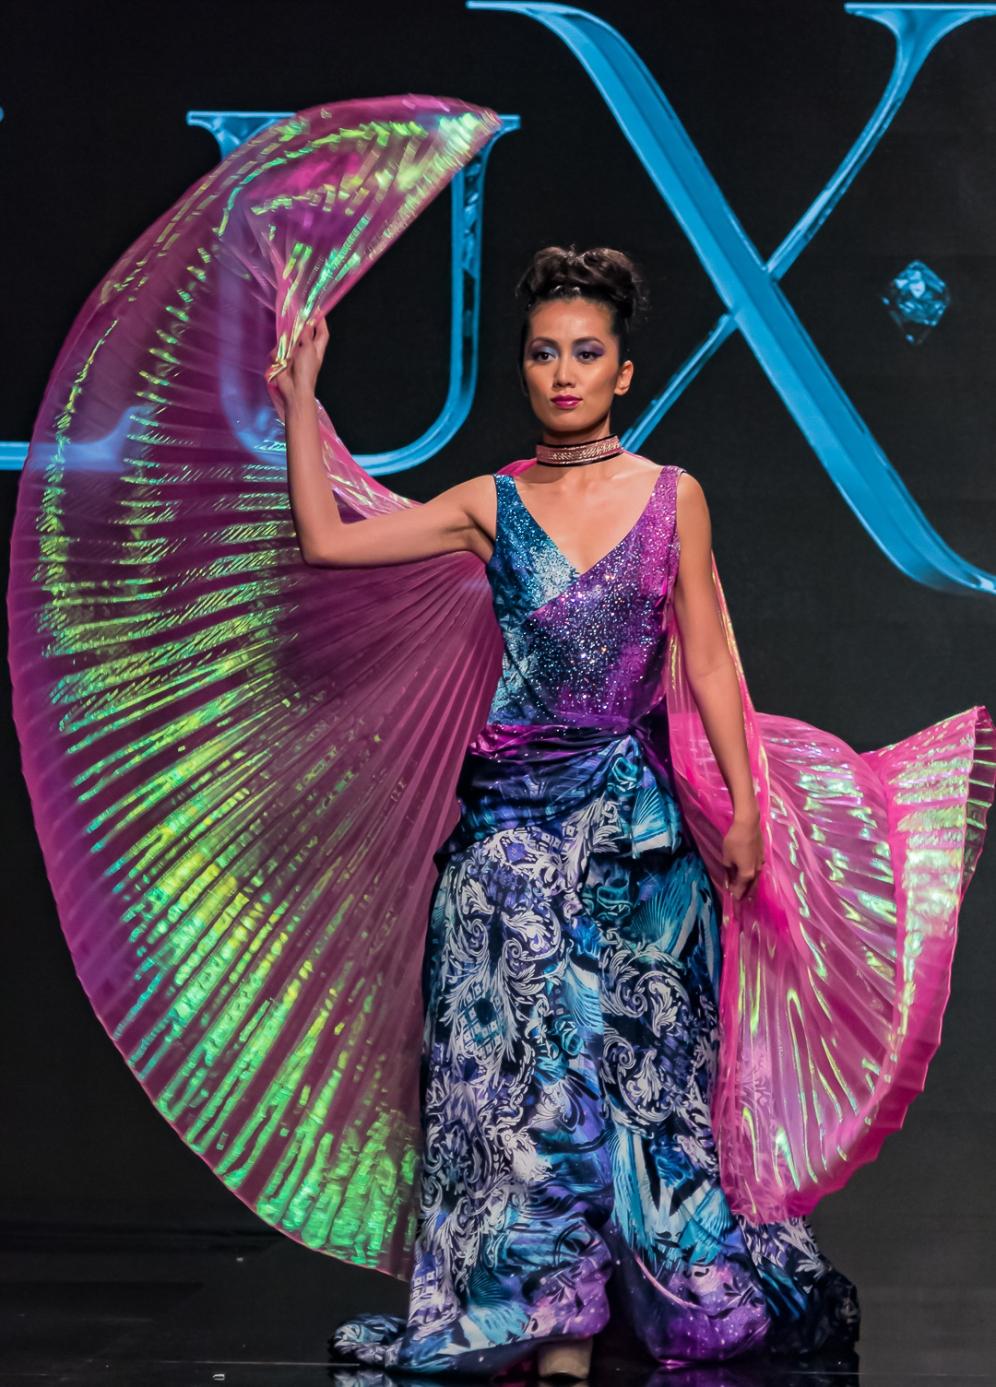 adonis-king-lian-showcase-art-hearts-fashion-4chion-lifestyle-12024